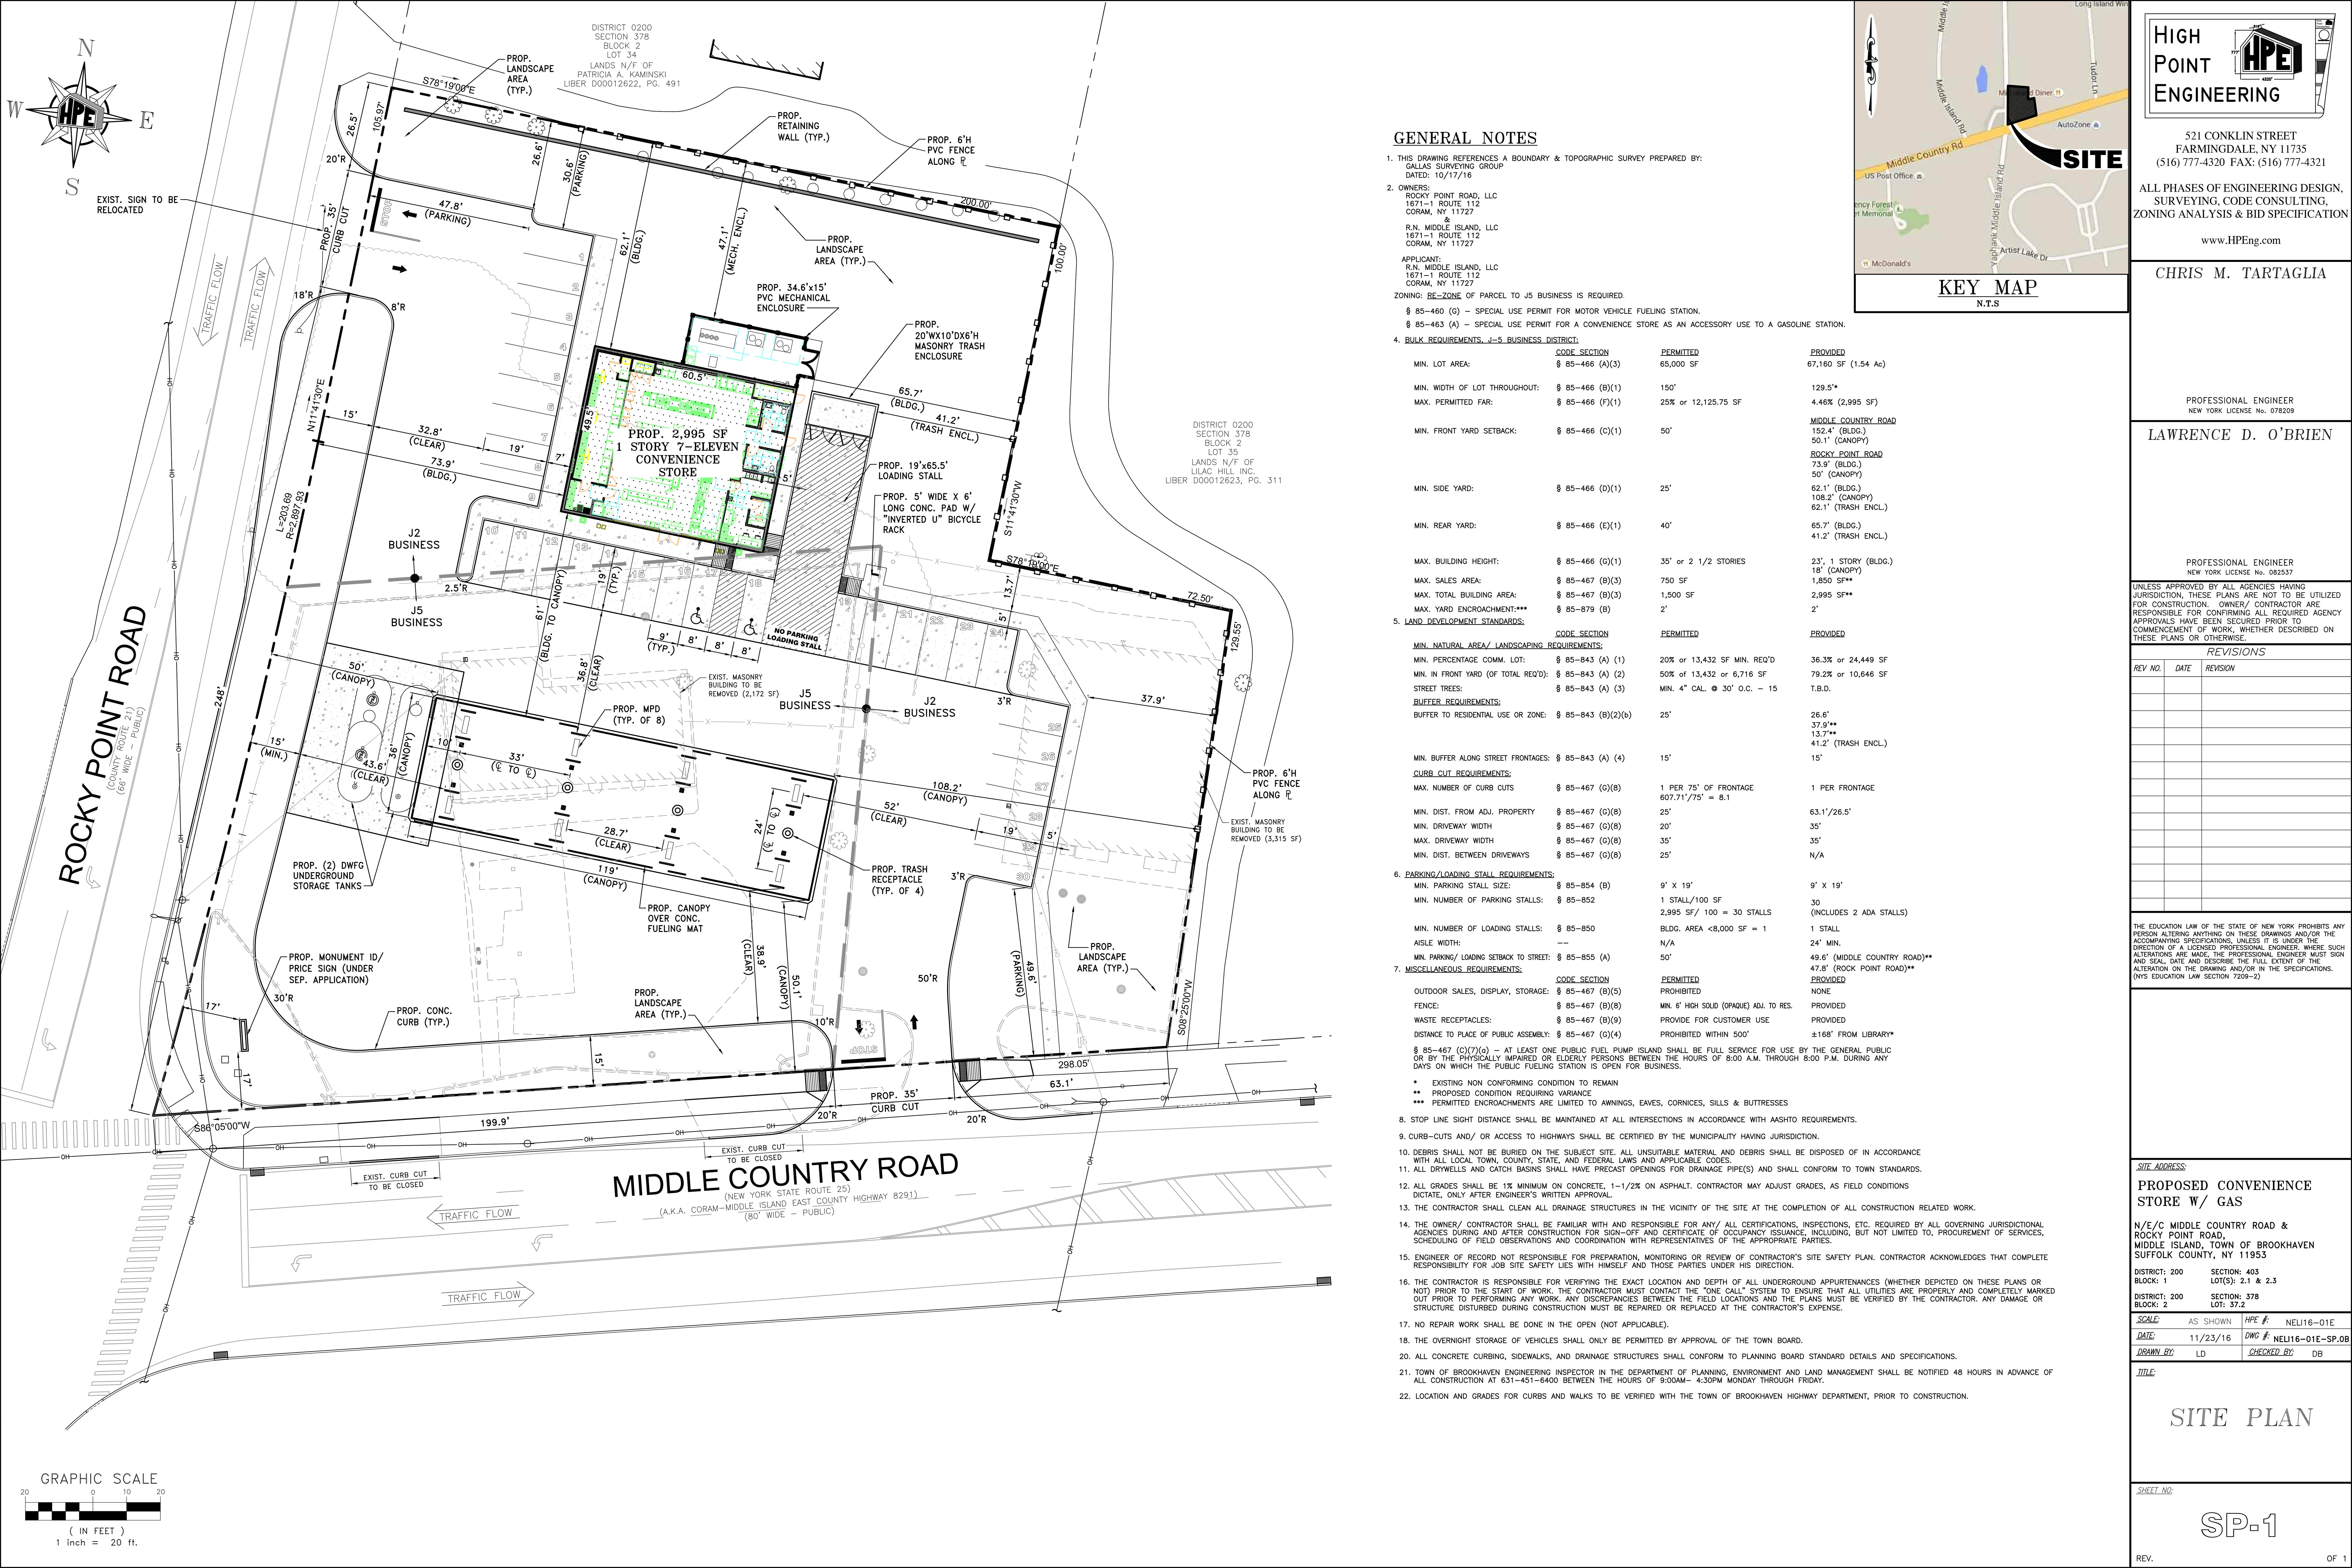 SP-1 Site Plan